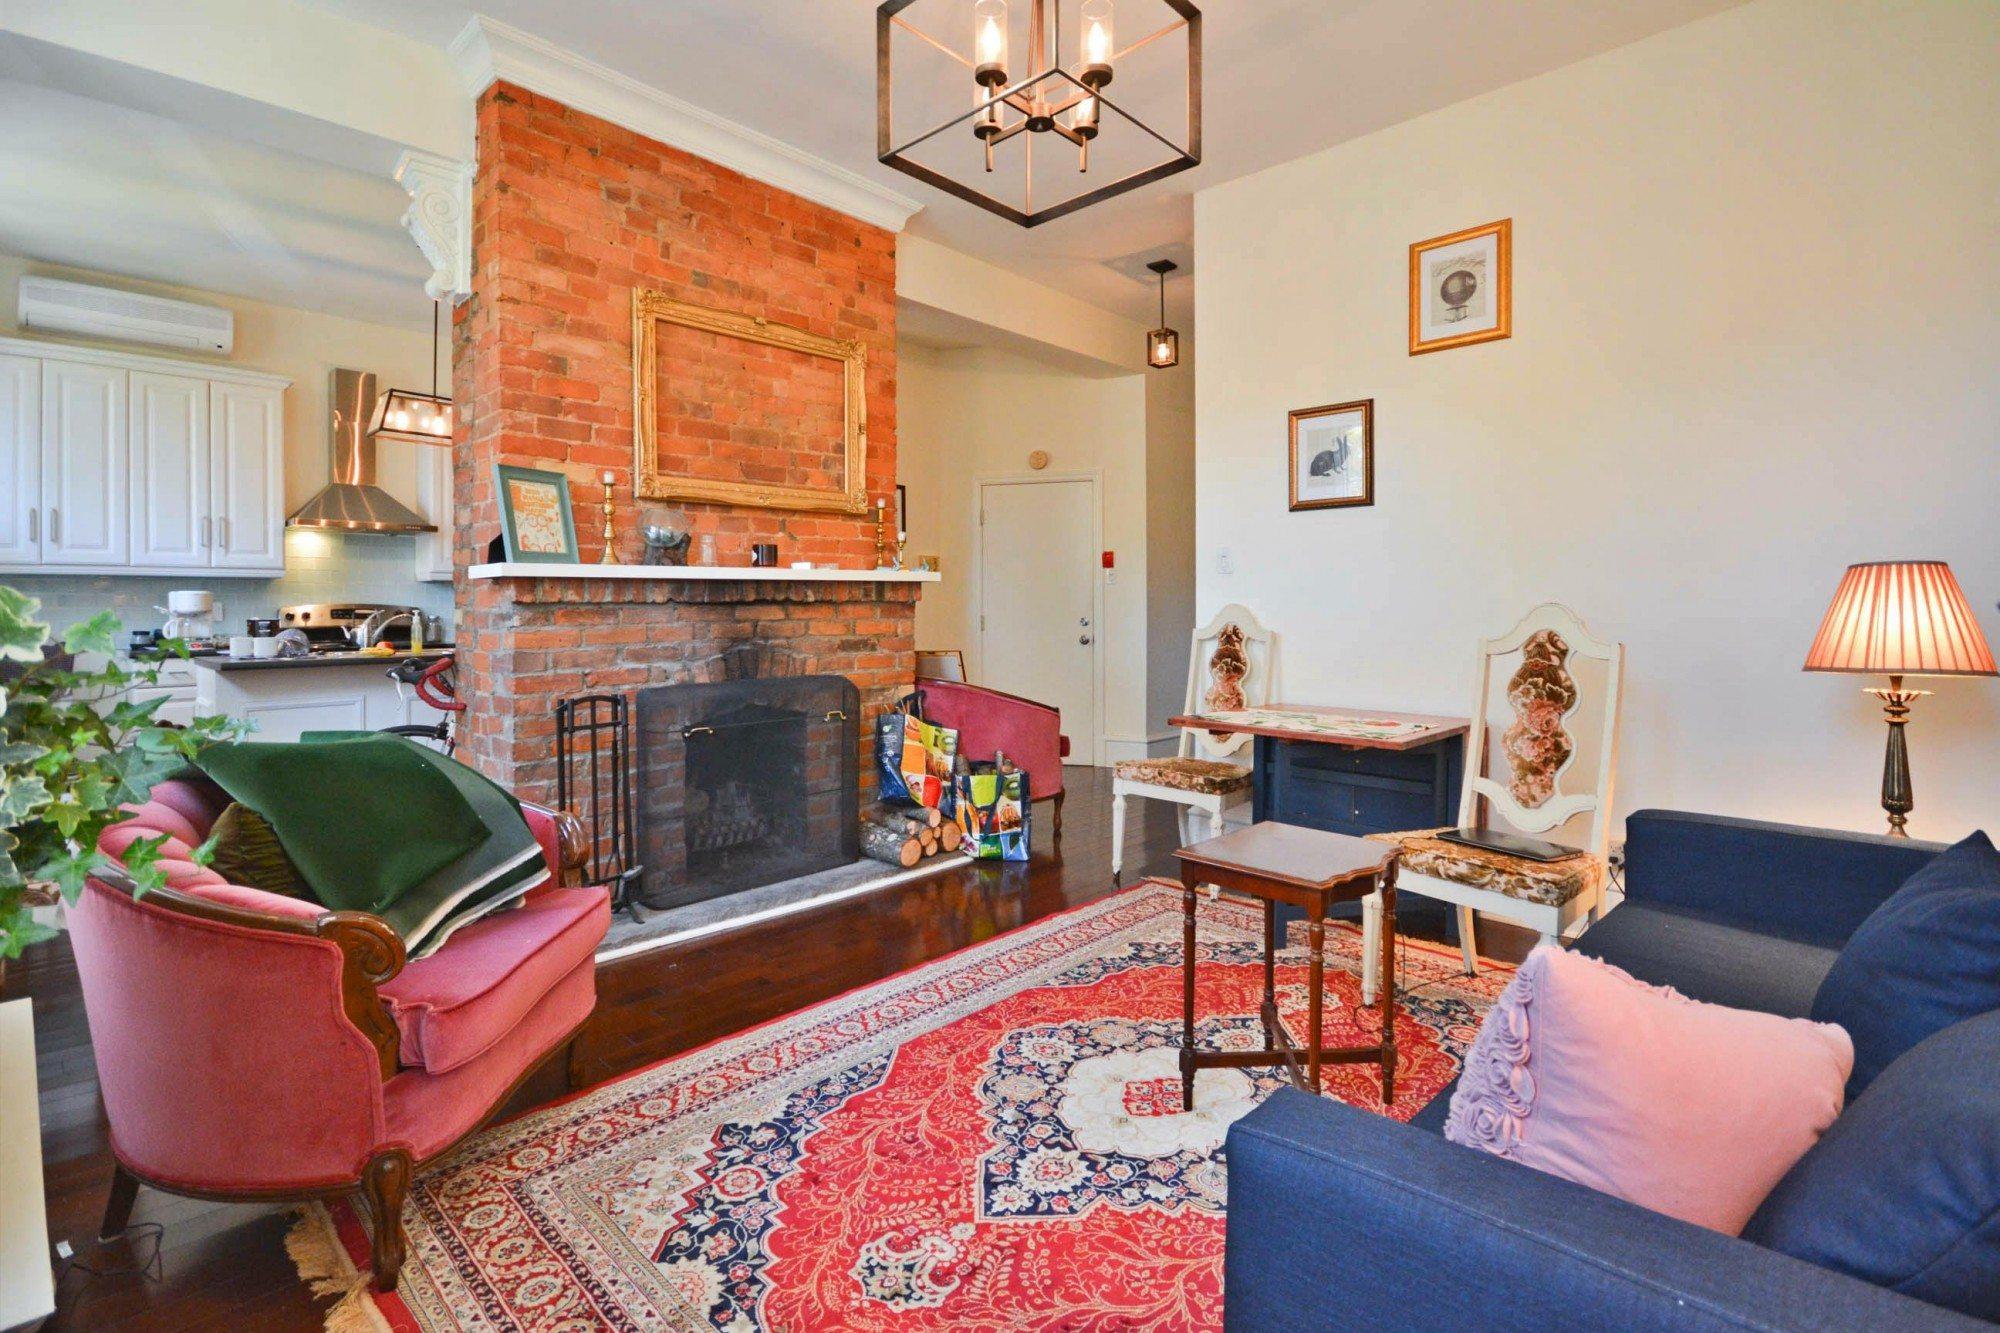 toronto-house-for-sale-81-pembroke-street-14